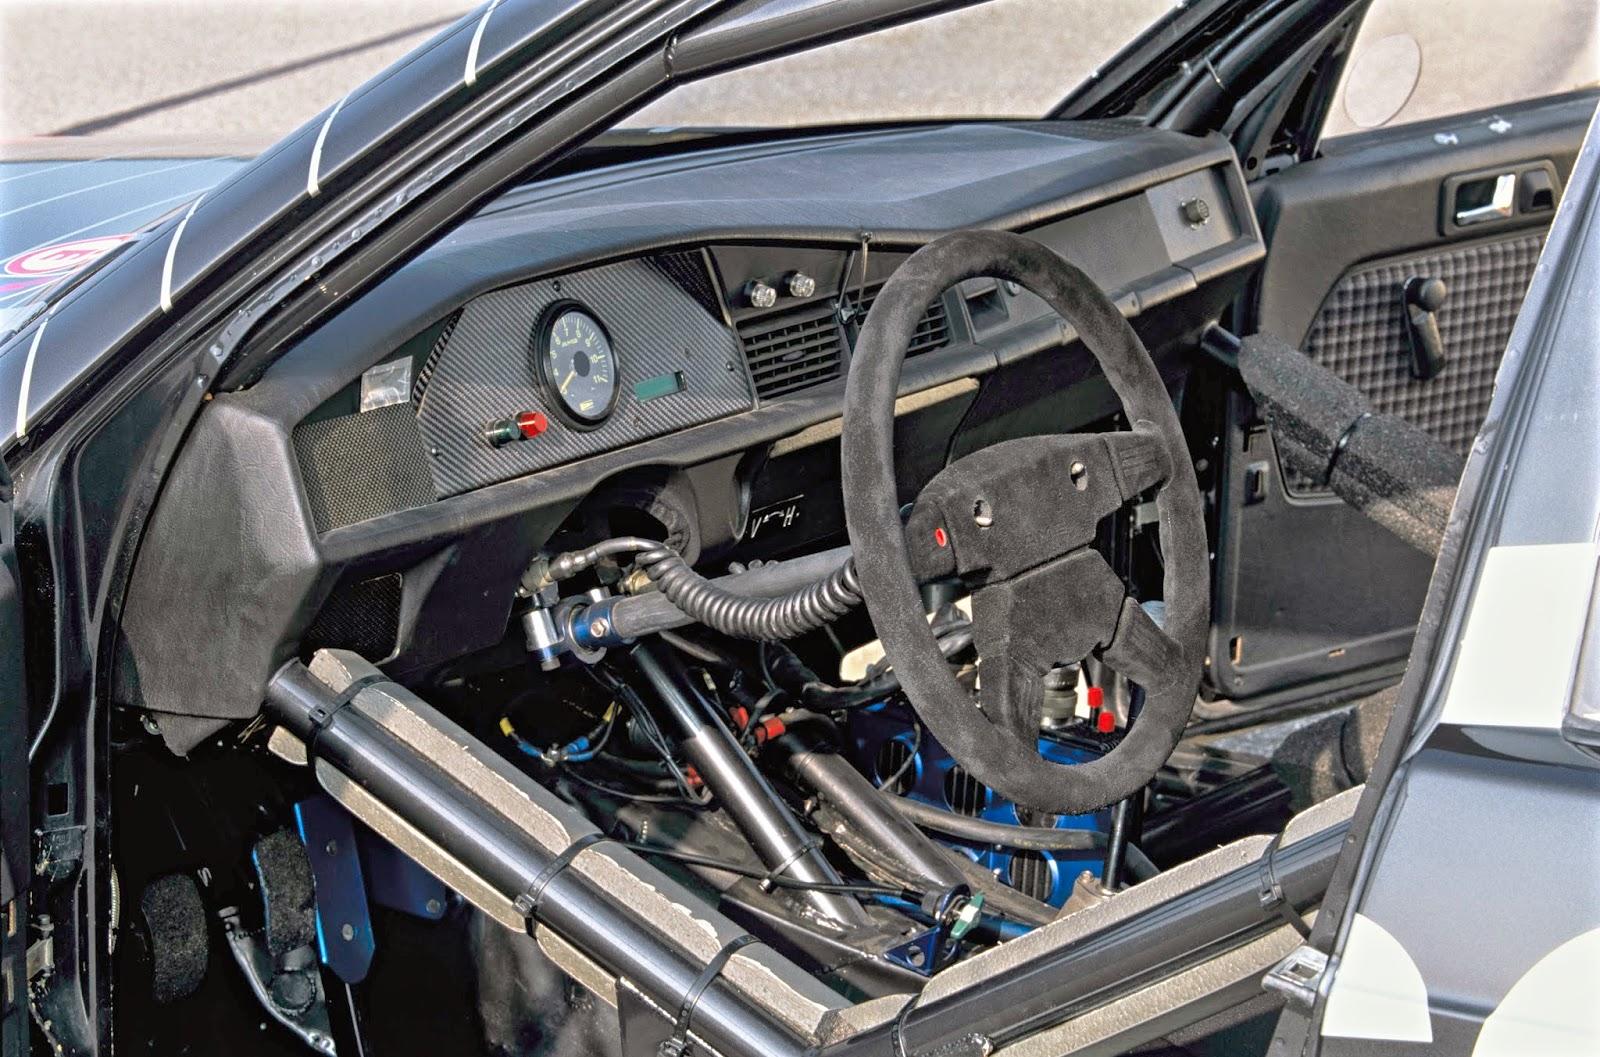 Mercedes Benz W201 2 5 16v Evolution Ii K Ludwig Benztuning